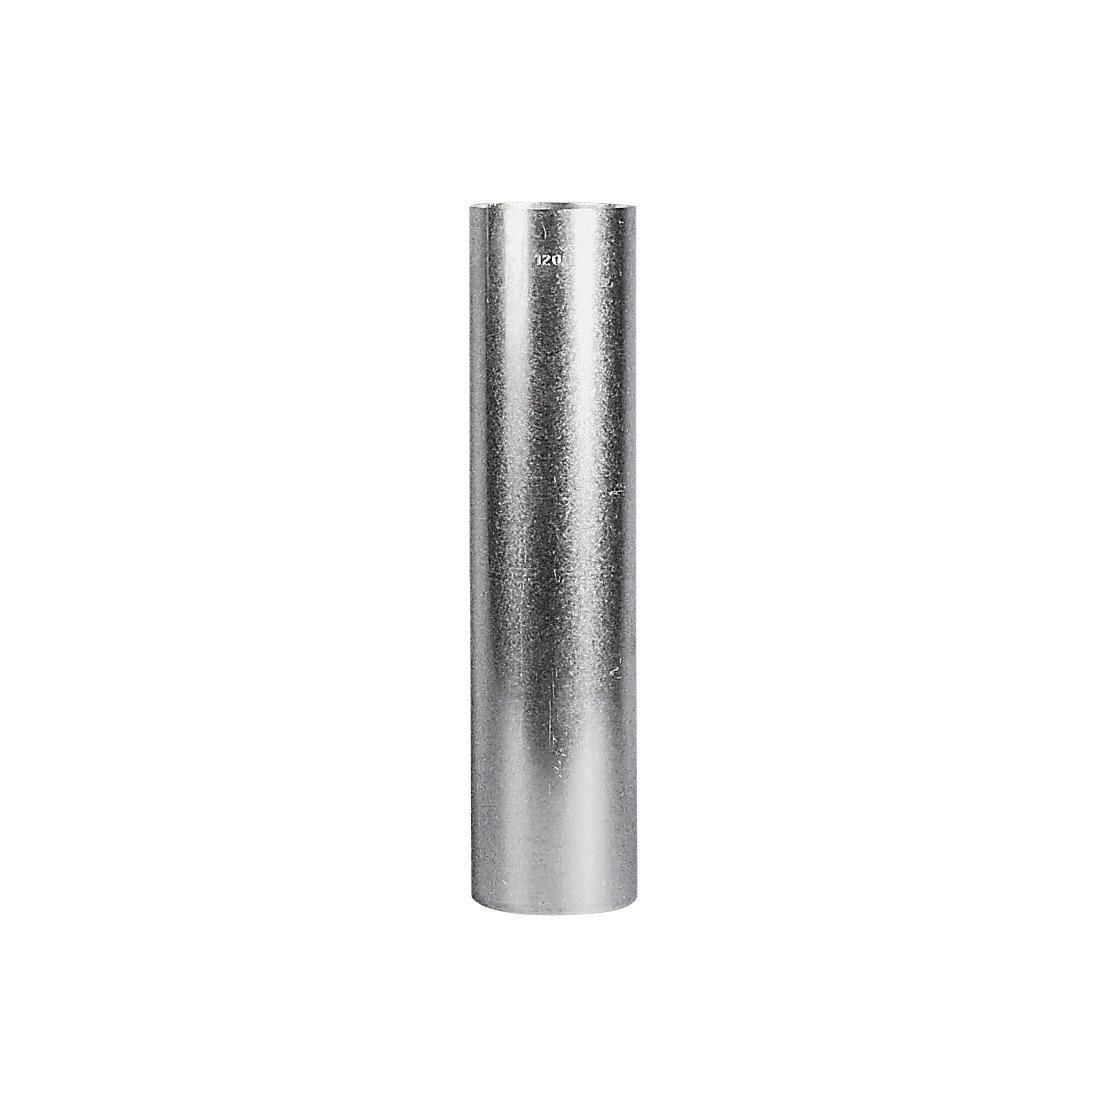 Rauchrohr, Ofenrohr Rohr 1,00 m FAL 150 ø 0,6mm stark Bertrams